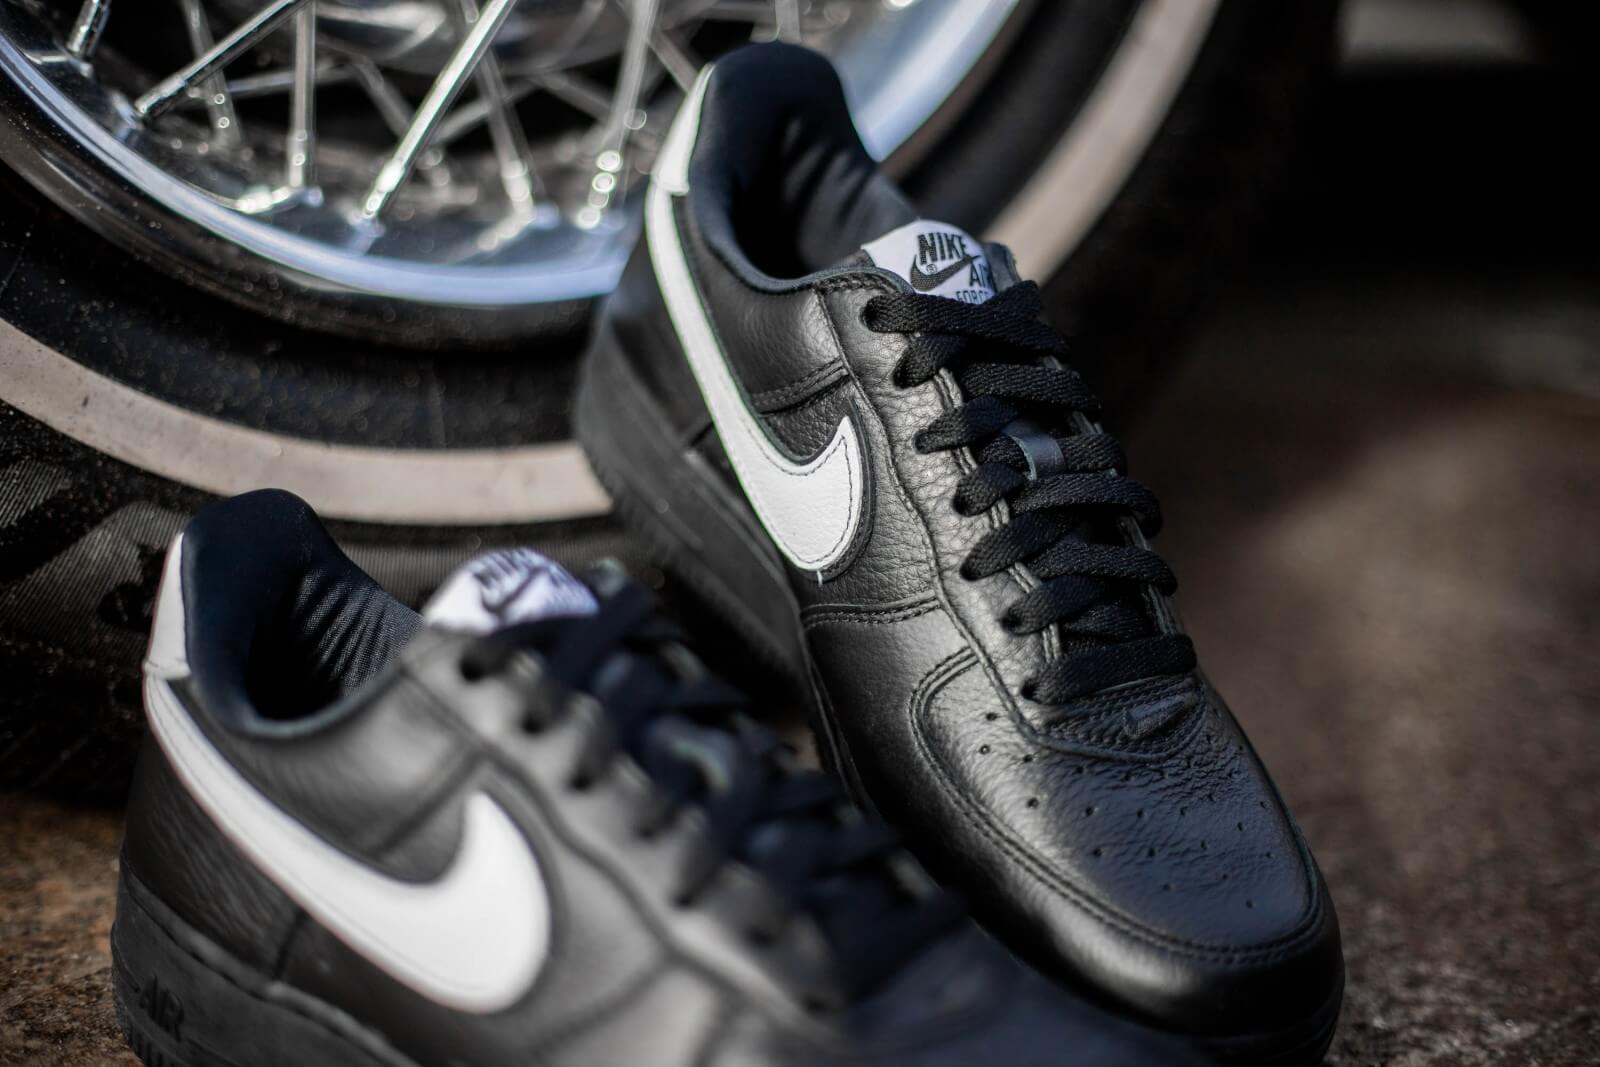 Nike Air Force 1 Low QS Black White CQ0492 001